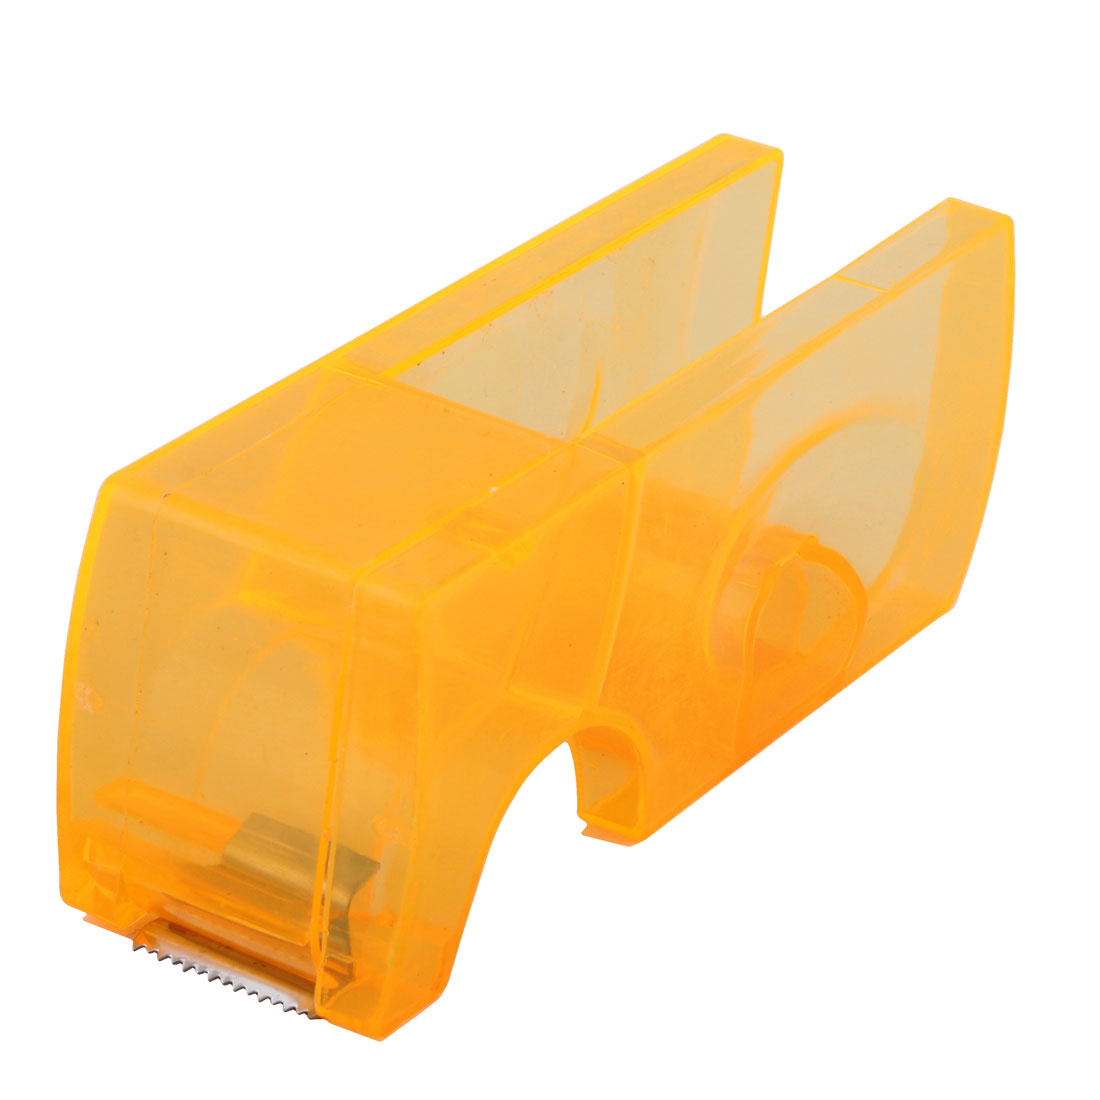 "Plastic Office Desktop 0.8"" Width Tape Cutter Holder Dispenser Clear Orange"